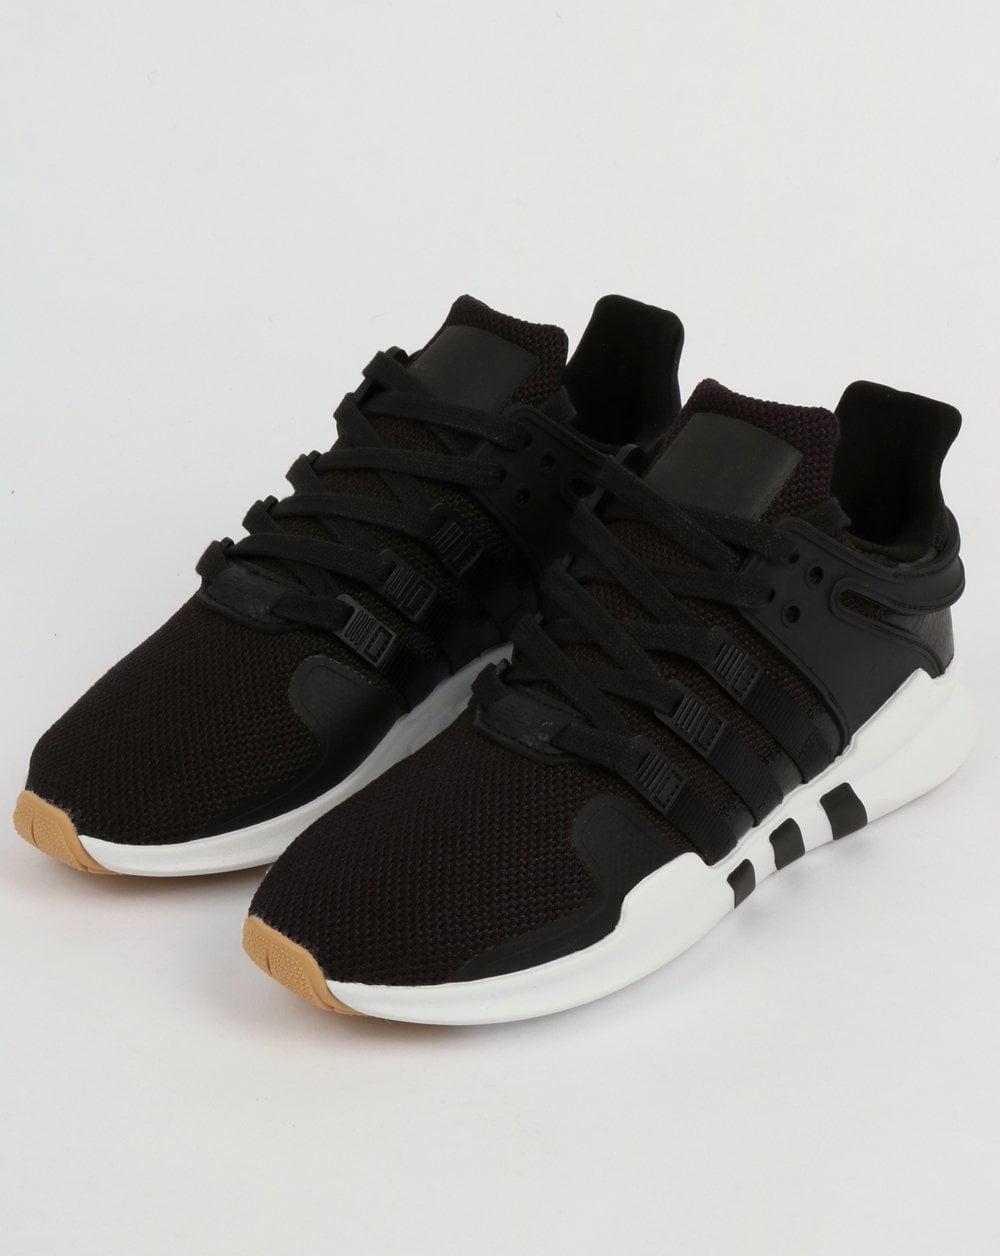 half off 770b7 4bba9 Adidas EQT Support Adv Trainers Black/White/Gum